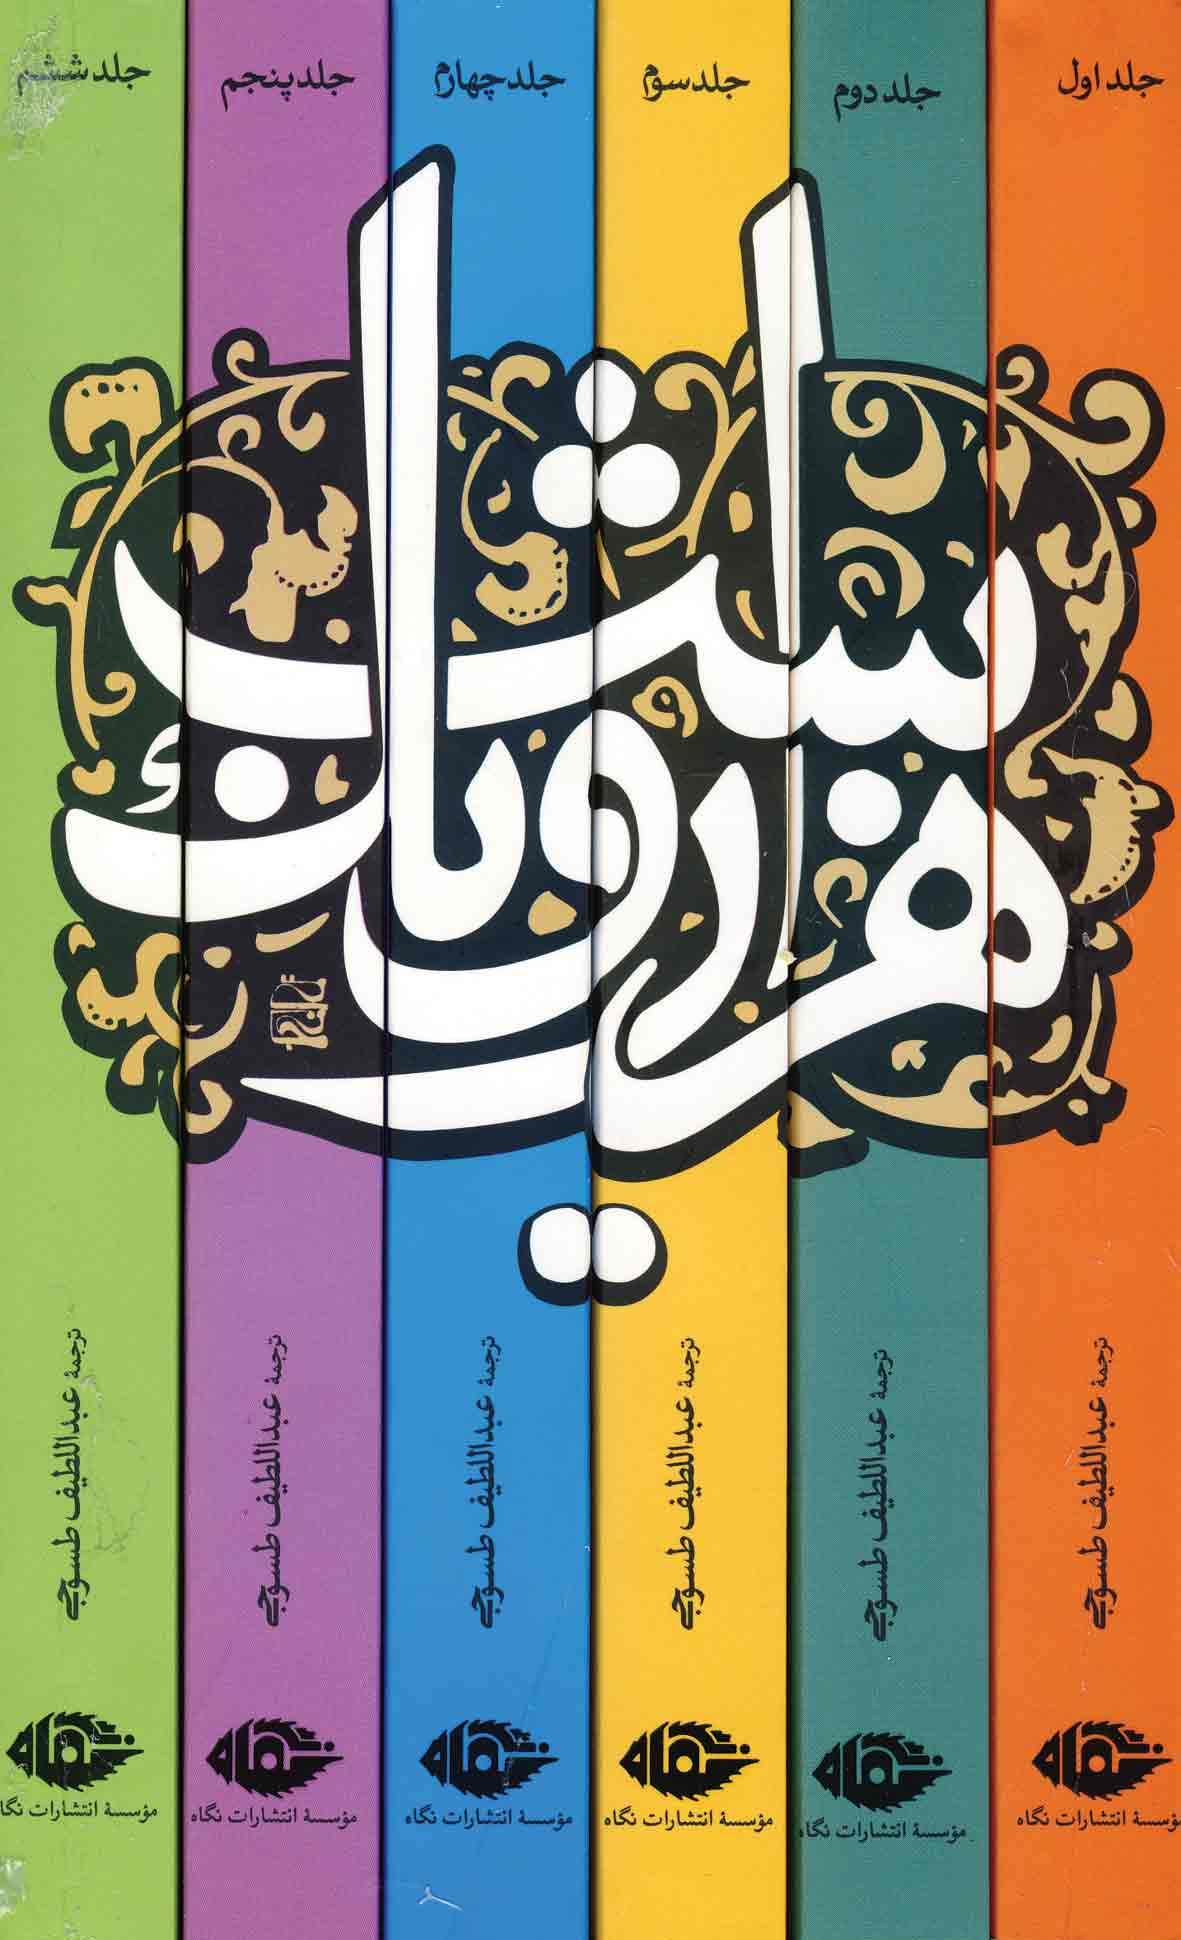 تصویر هزار و يك شب 6جلدي باقاب